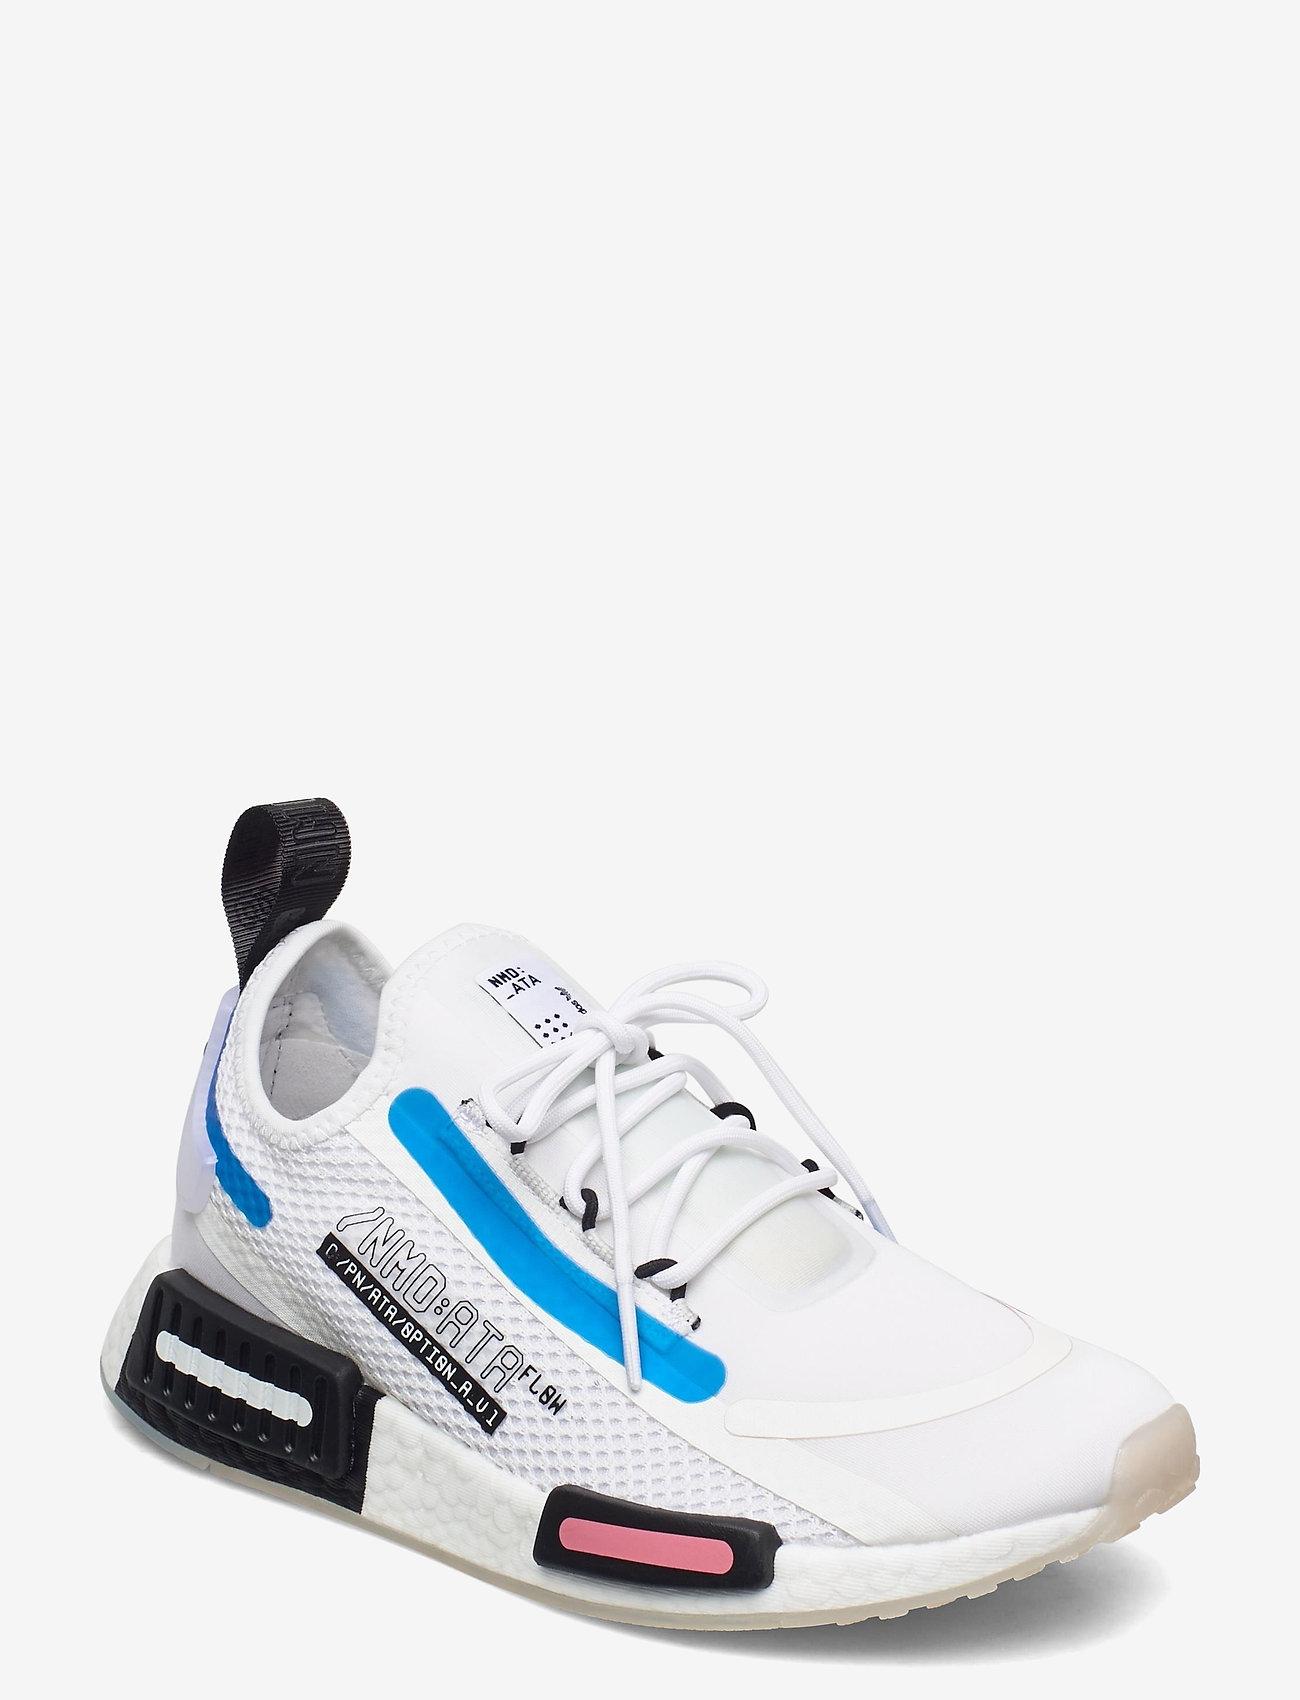 adidas Originals - NMD_R1 SPECTOO W - sneakers - ftwwht/ftwwht/cblack - 0